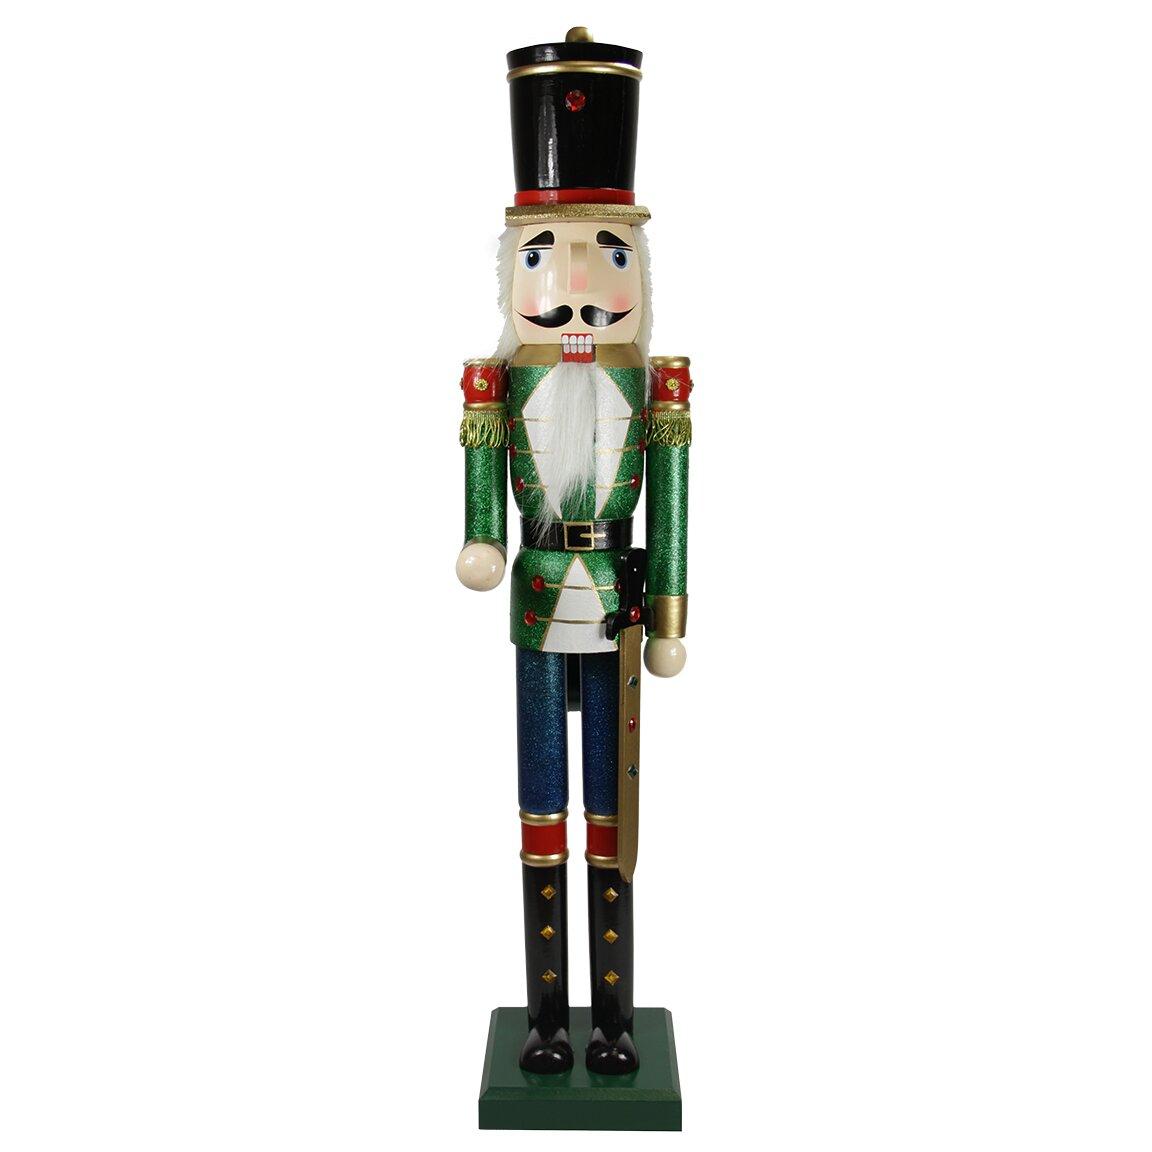 Christmas Wooden Nutcracker Soldier